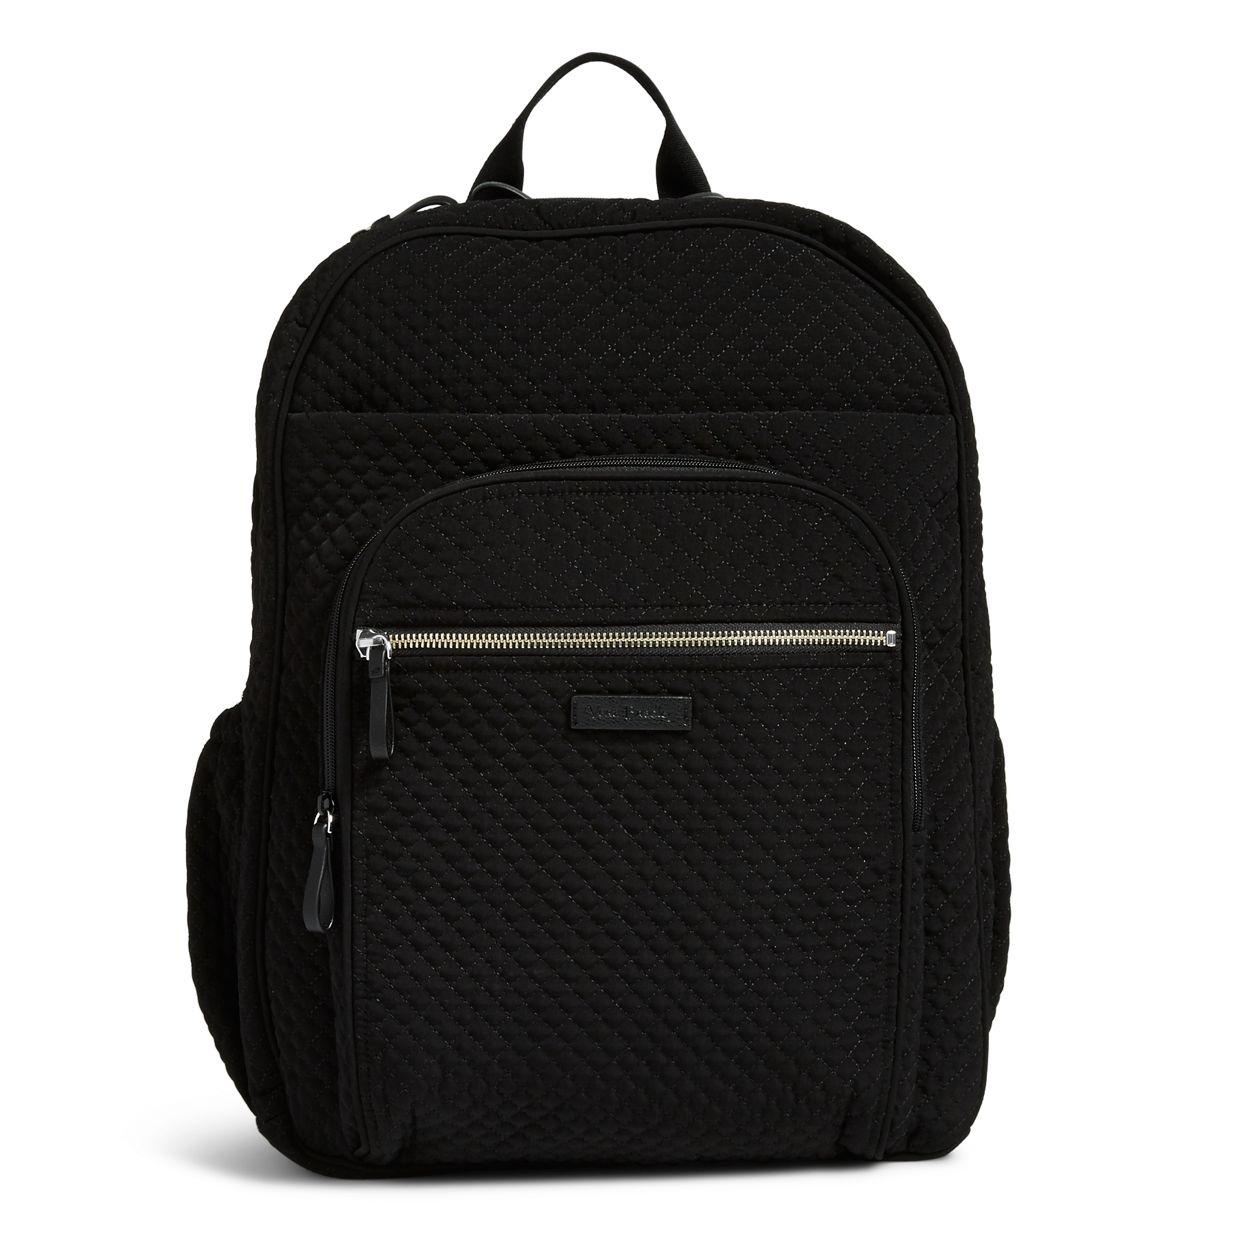 Xl Campus Backpack Vera Bradley